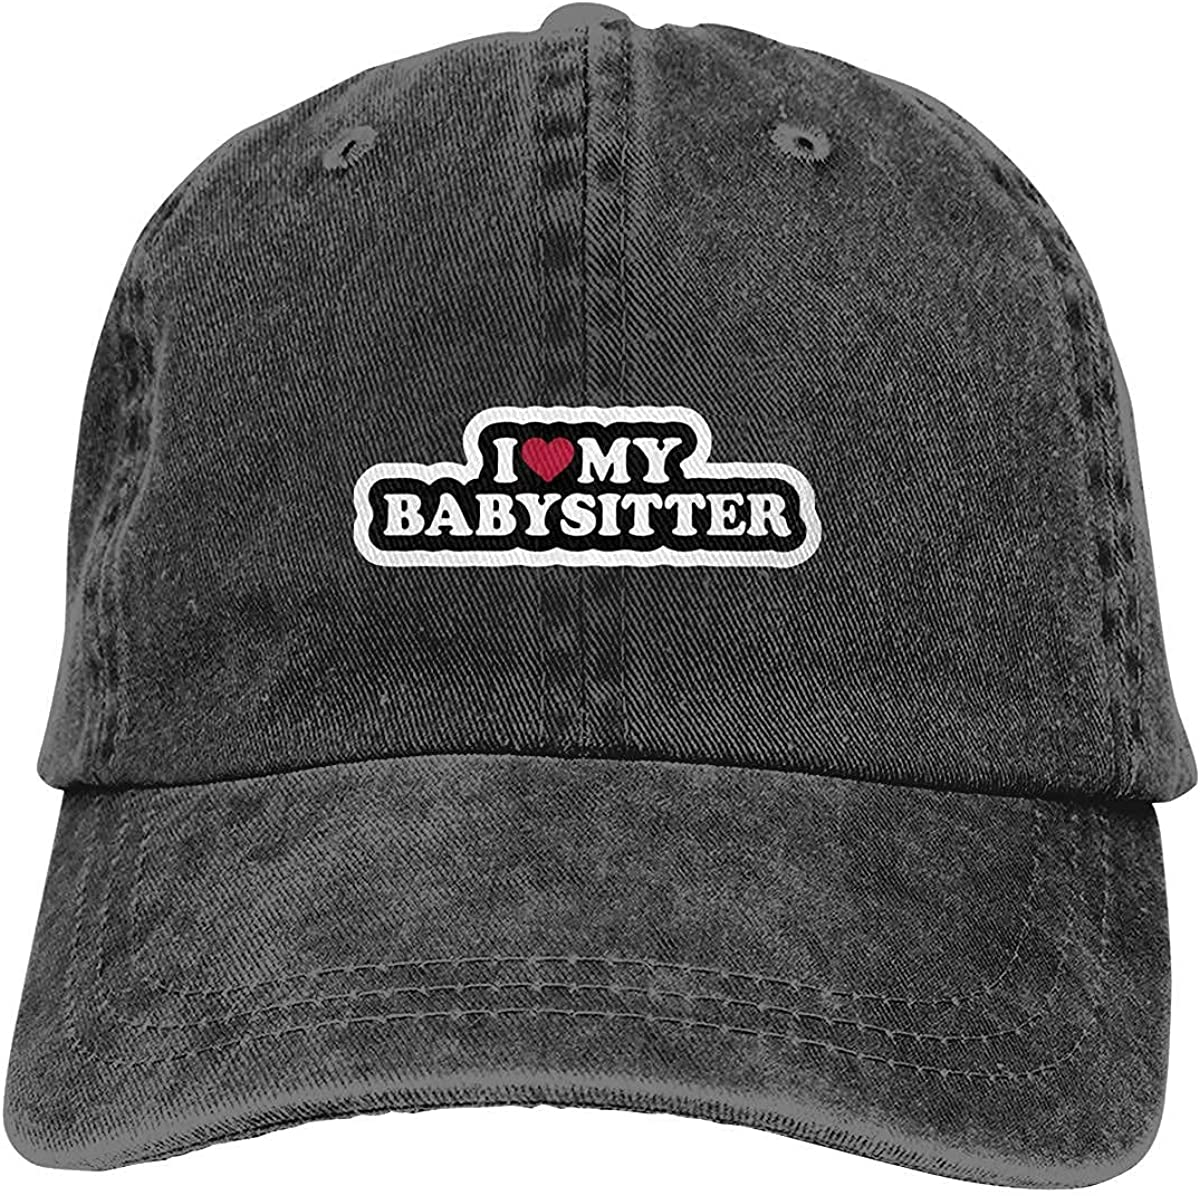 I-Love-My-Babysitter Vintage Hat Classic Washed 100% Cotton Black Adjustable Cowboy hat for Men and Women